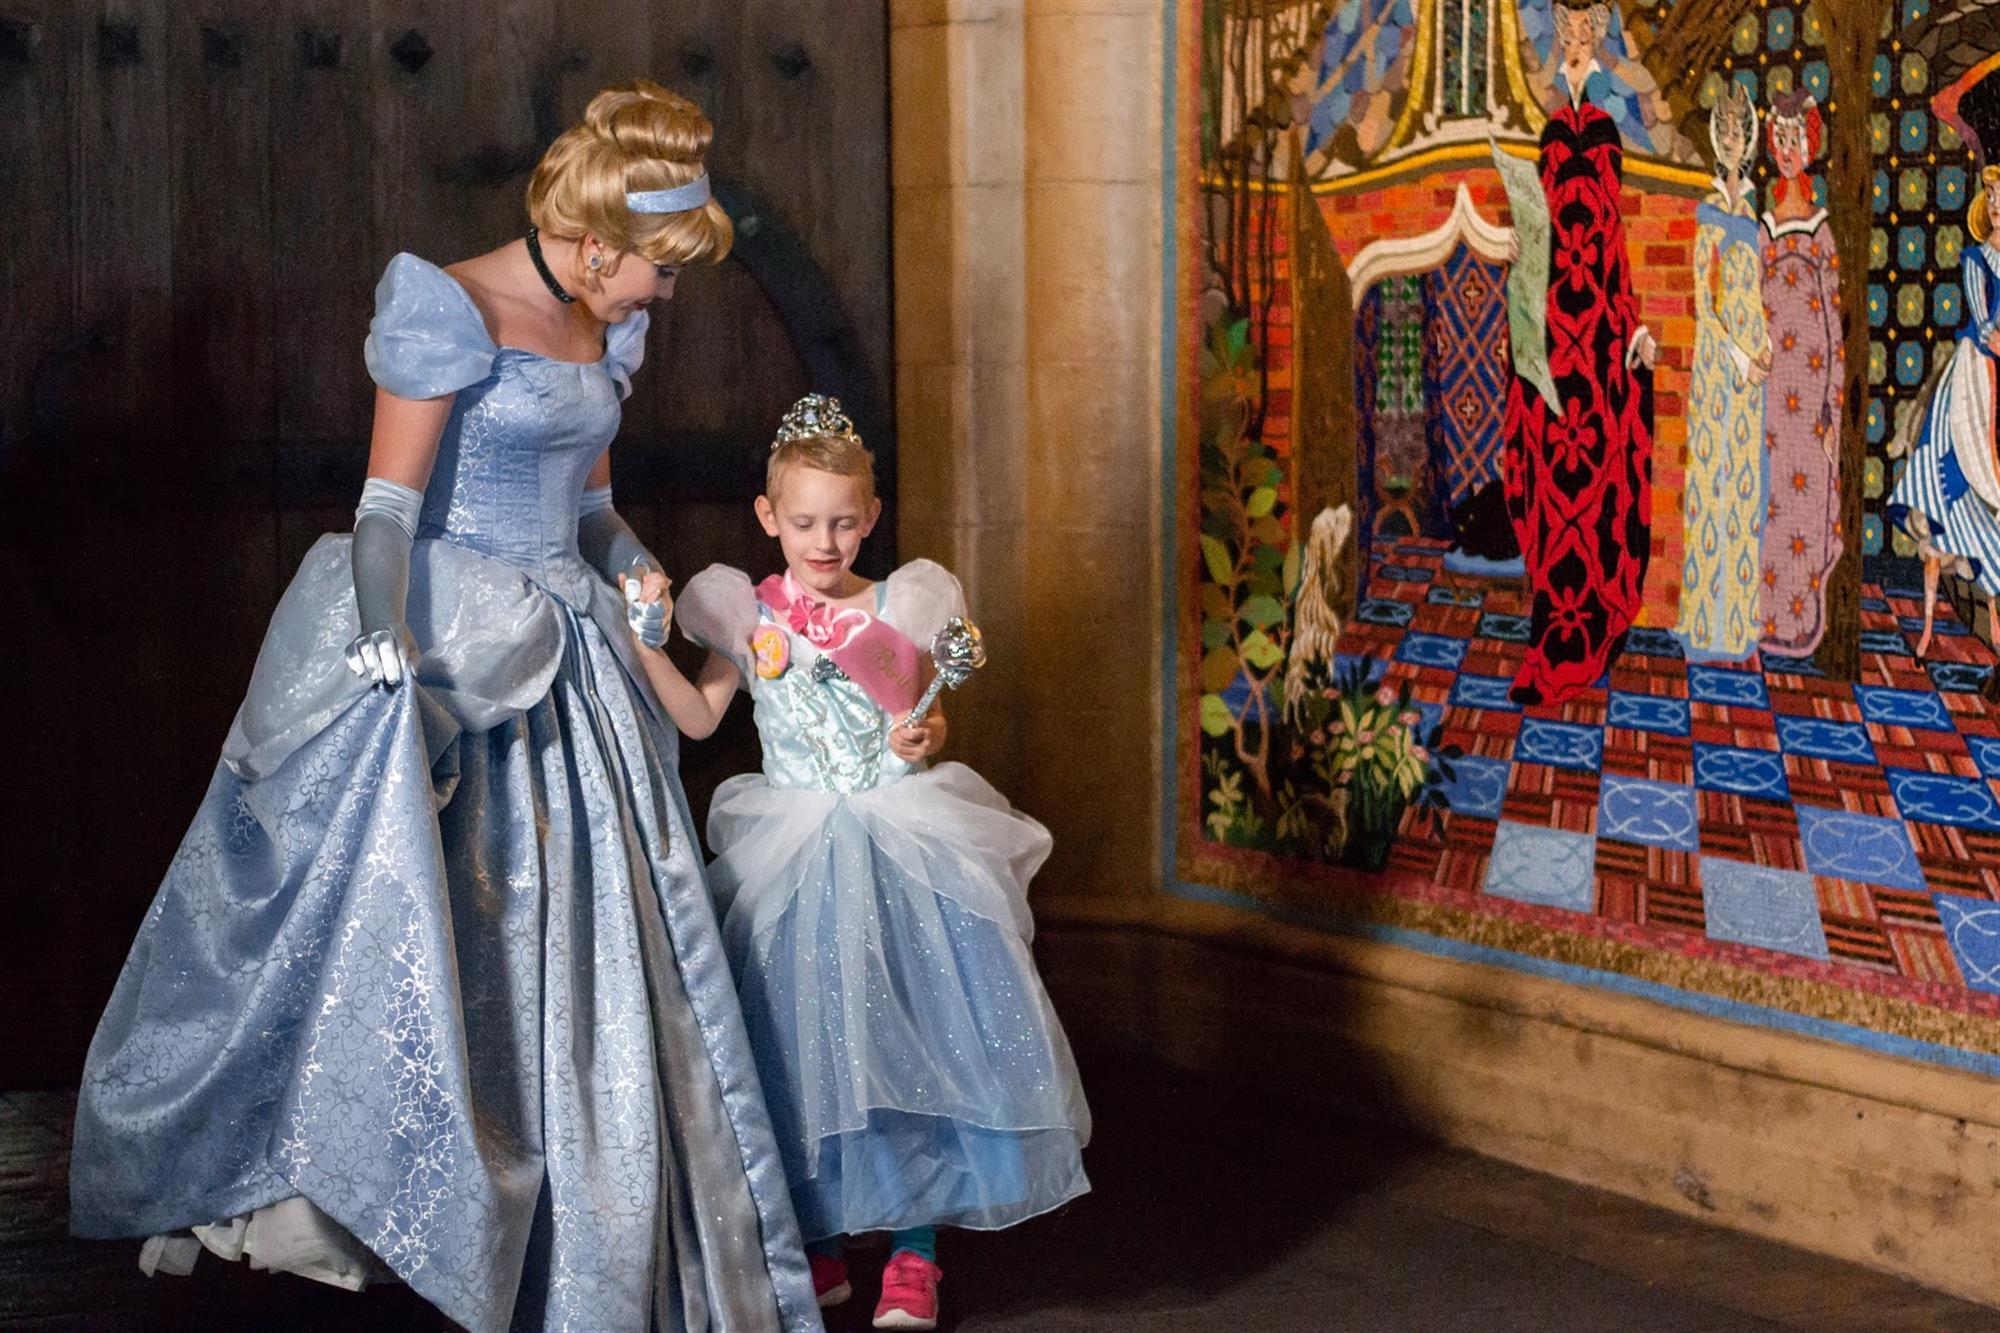 Disney Celebrates World Wish Day With Donation and #FriendLikeMe